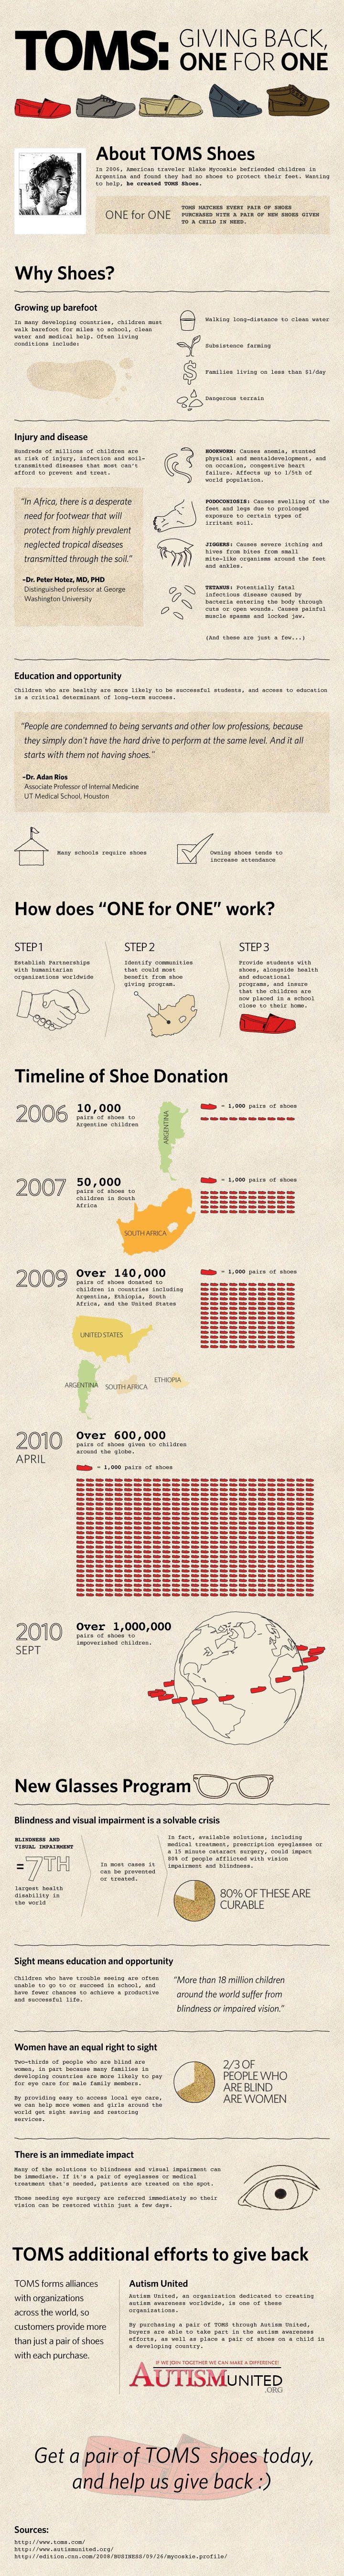 toms-infographic.jpg (720×5390)